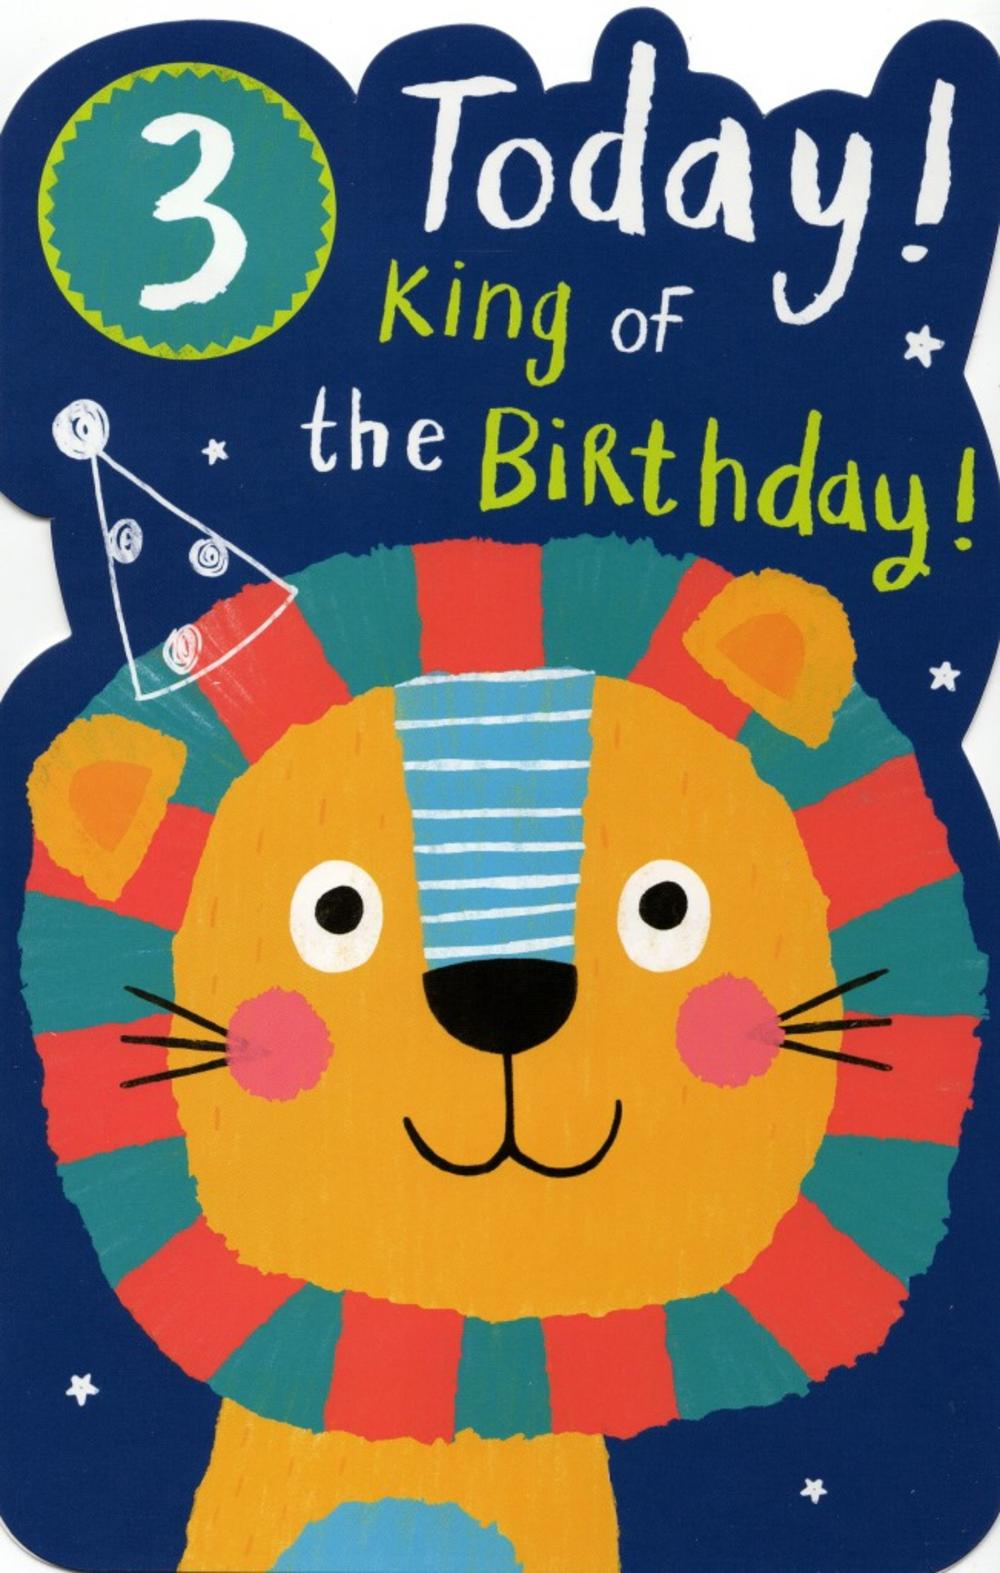 Third Birthday Greeting Cards